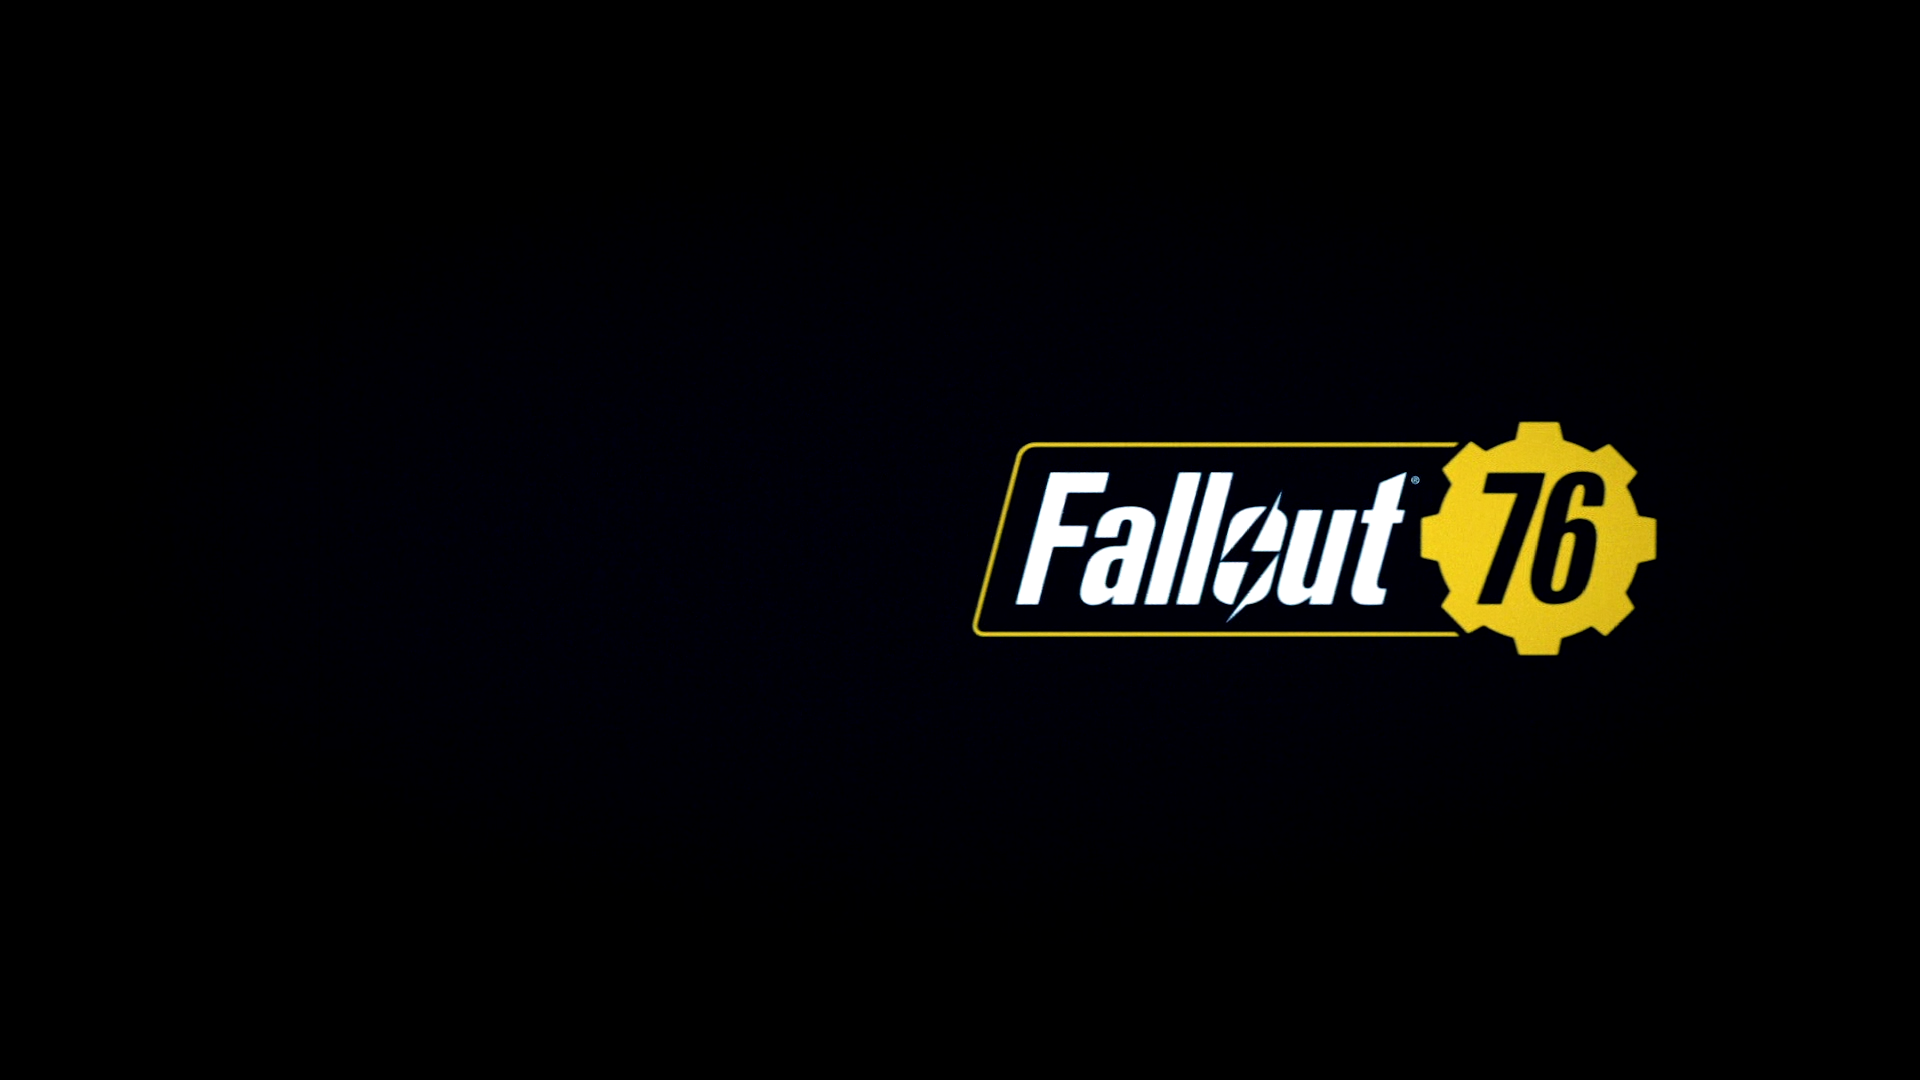 Fallout 76 Title Screen